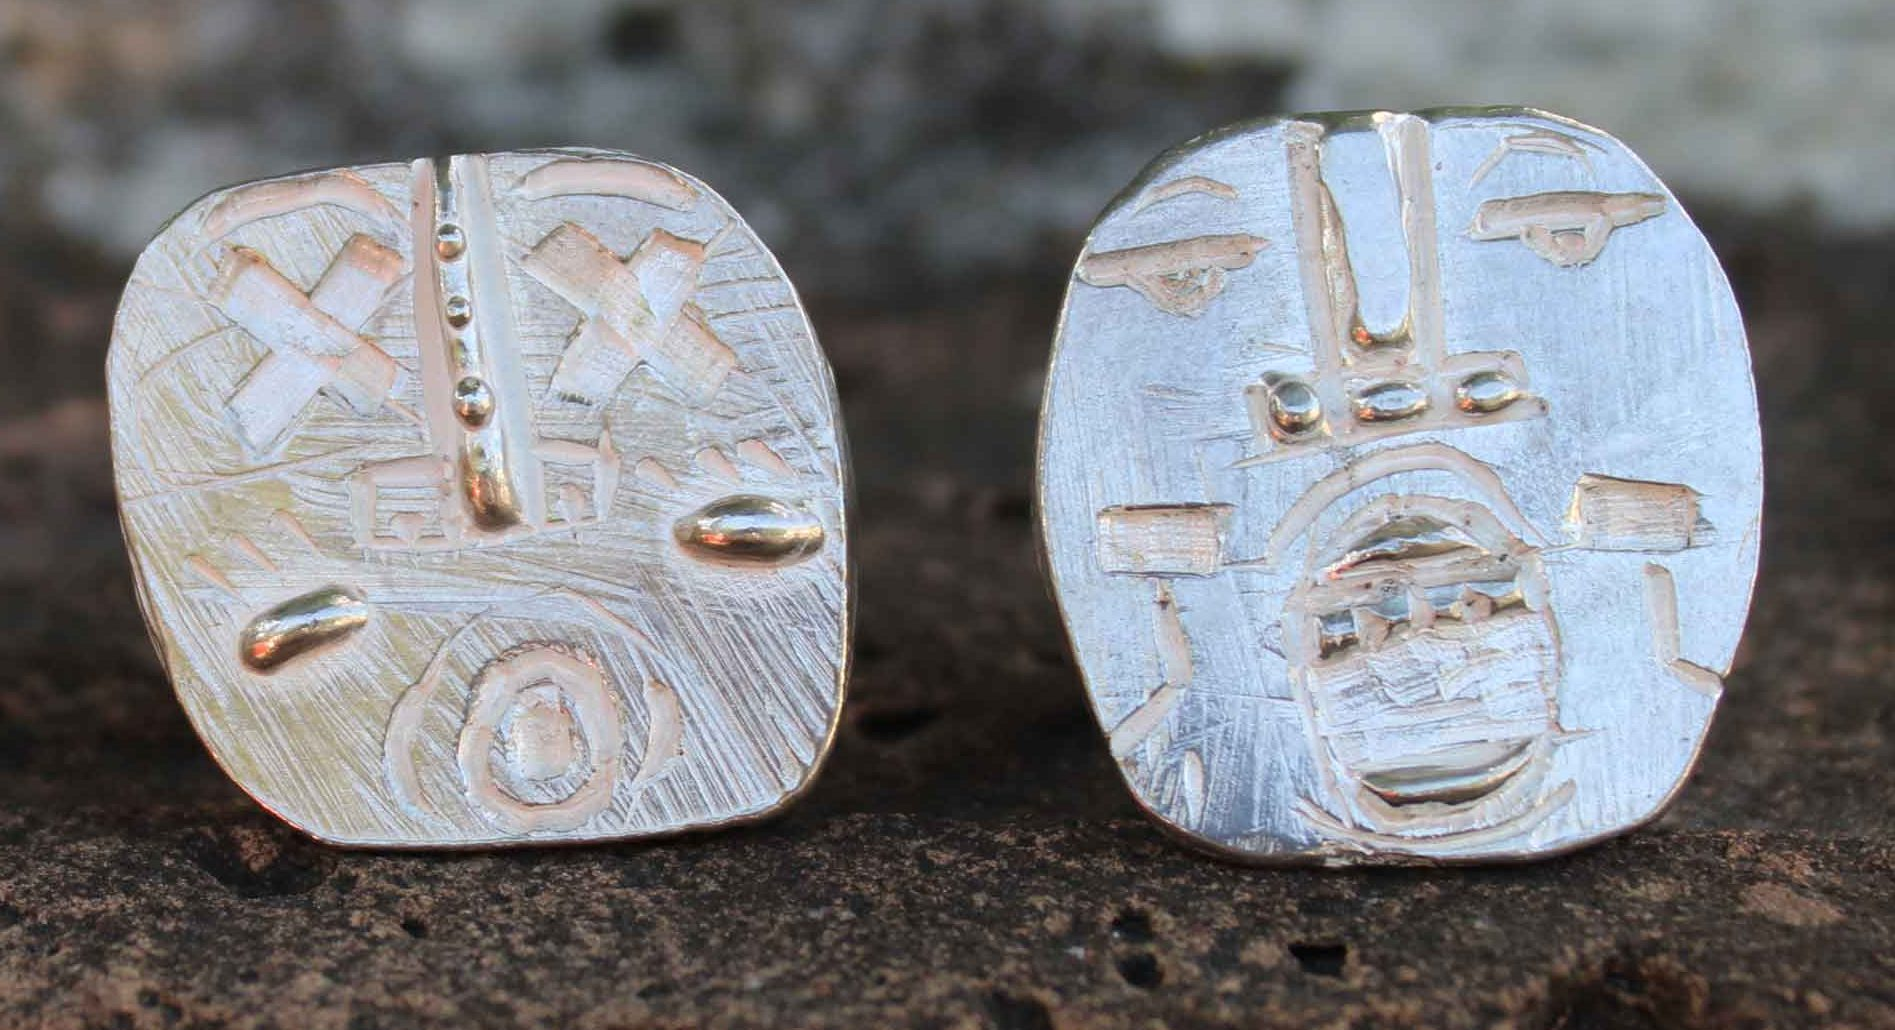 Kalkidan Hoex, New Tribe Ring Ten, ringen, zilver